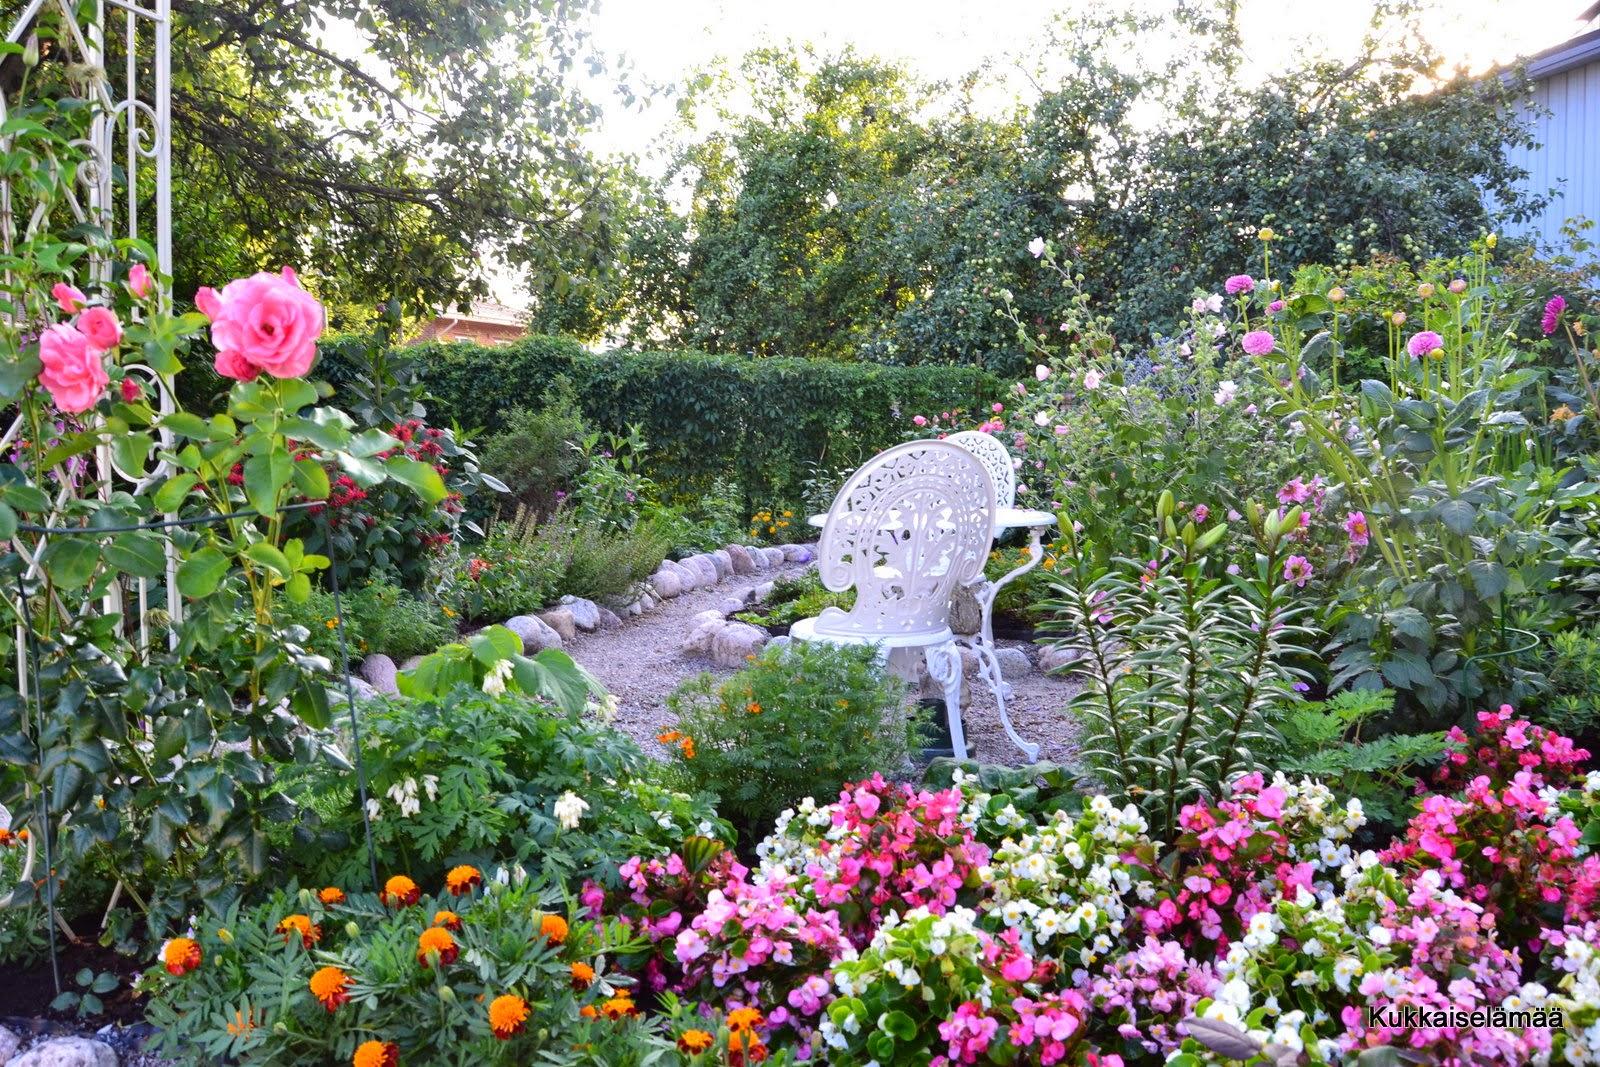 Daalioiden aikaa – Dahlias and other flowers